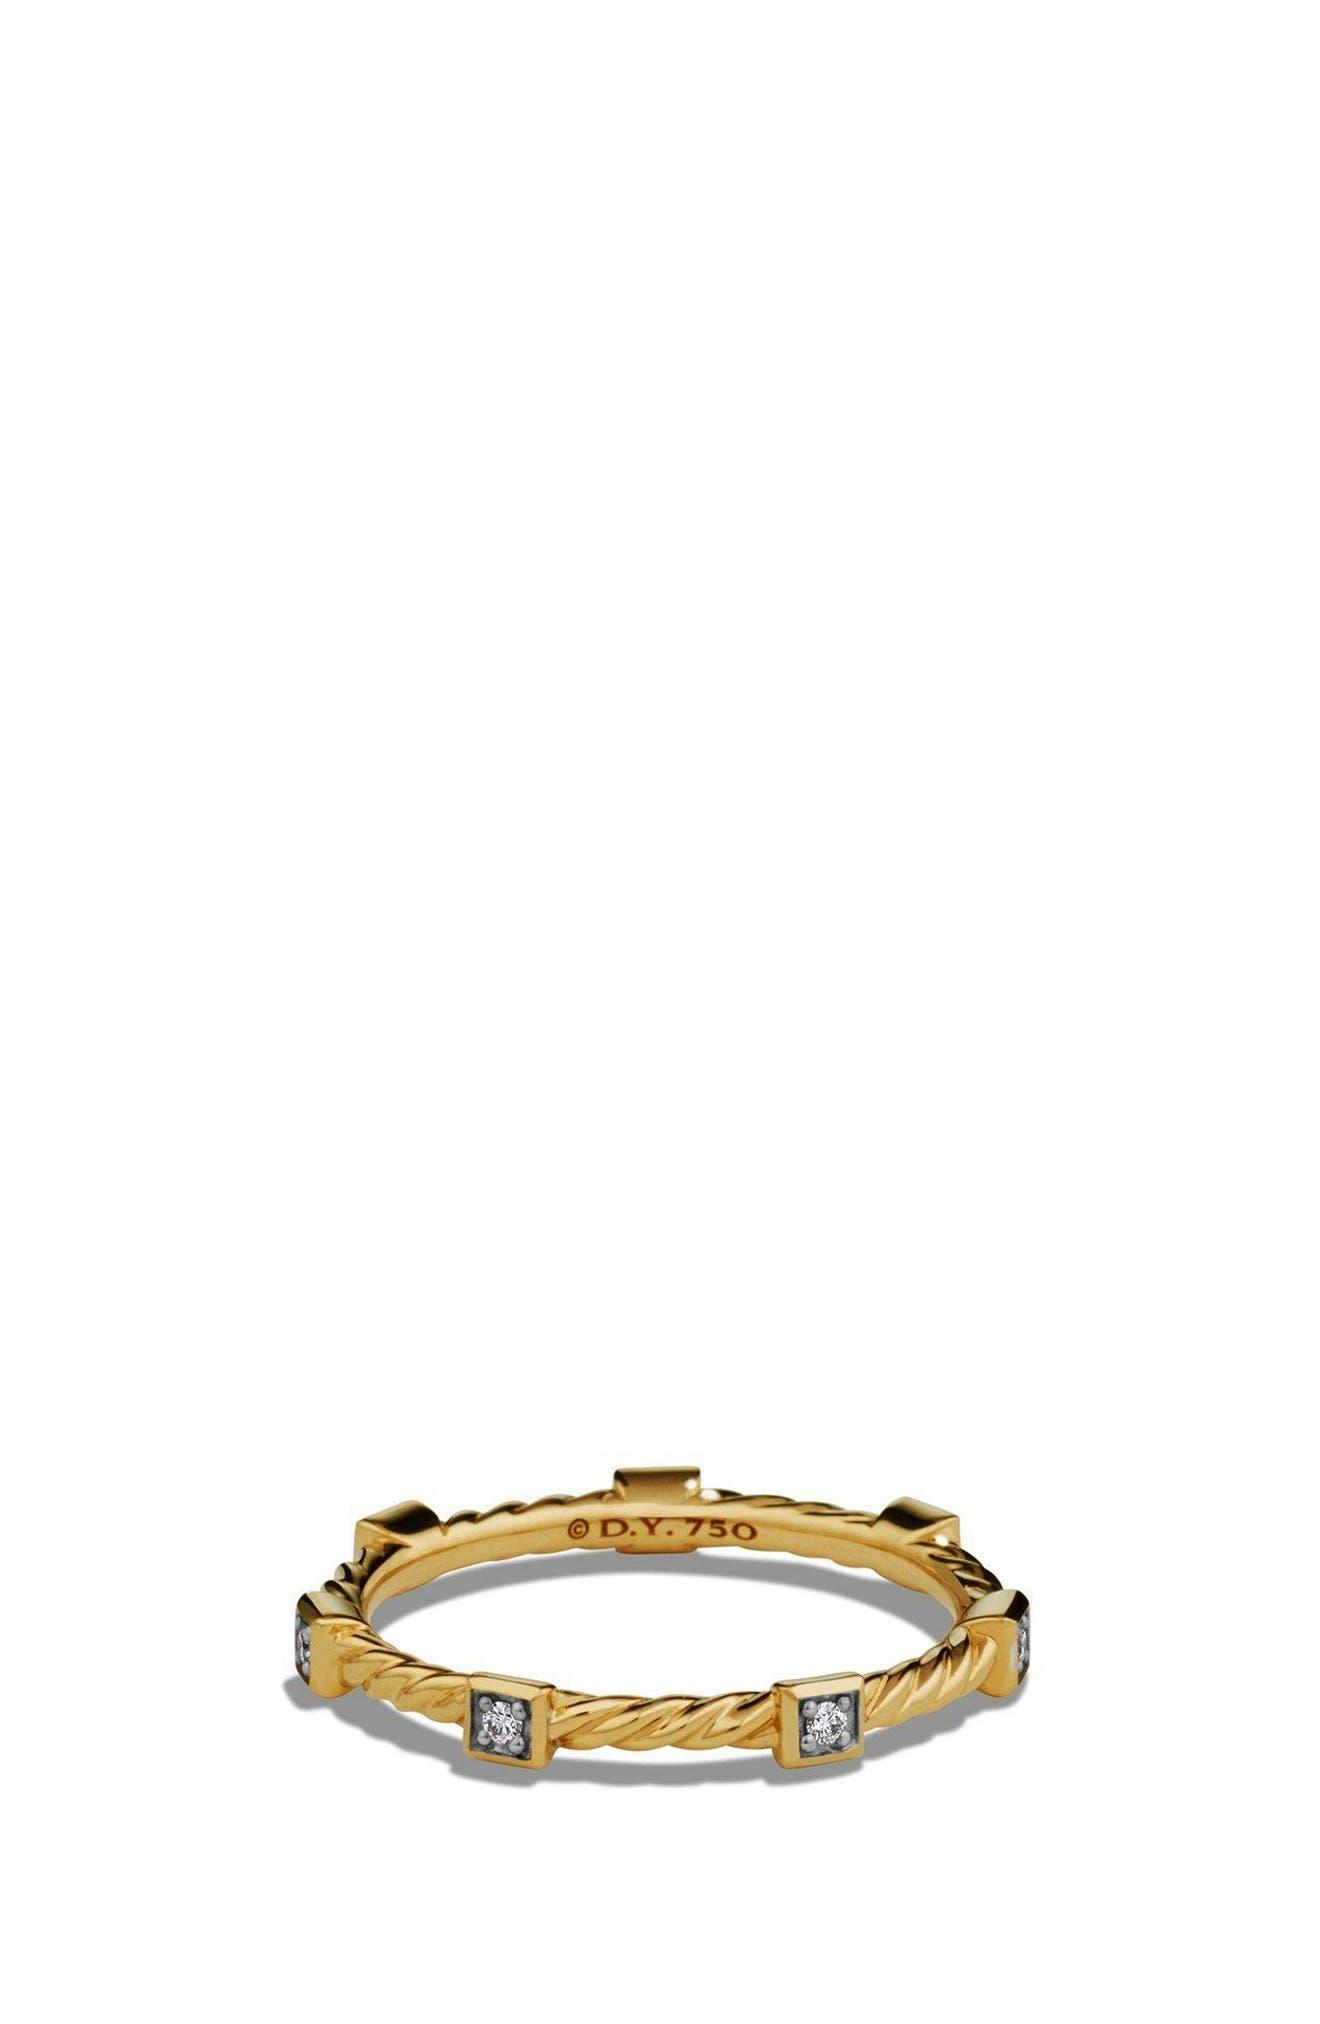 david yurman paveflex ring with diamonds in 18k gold 27mm